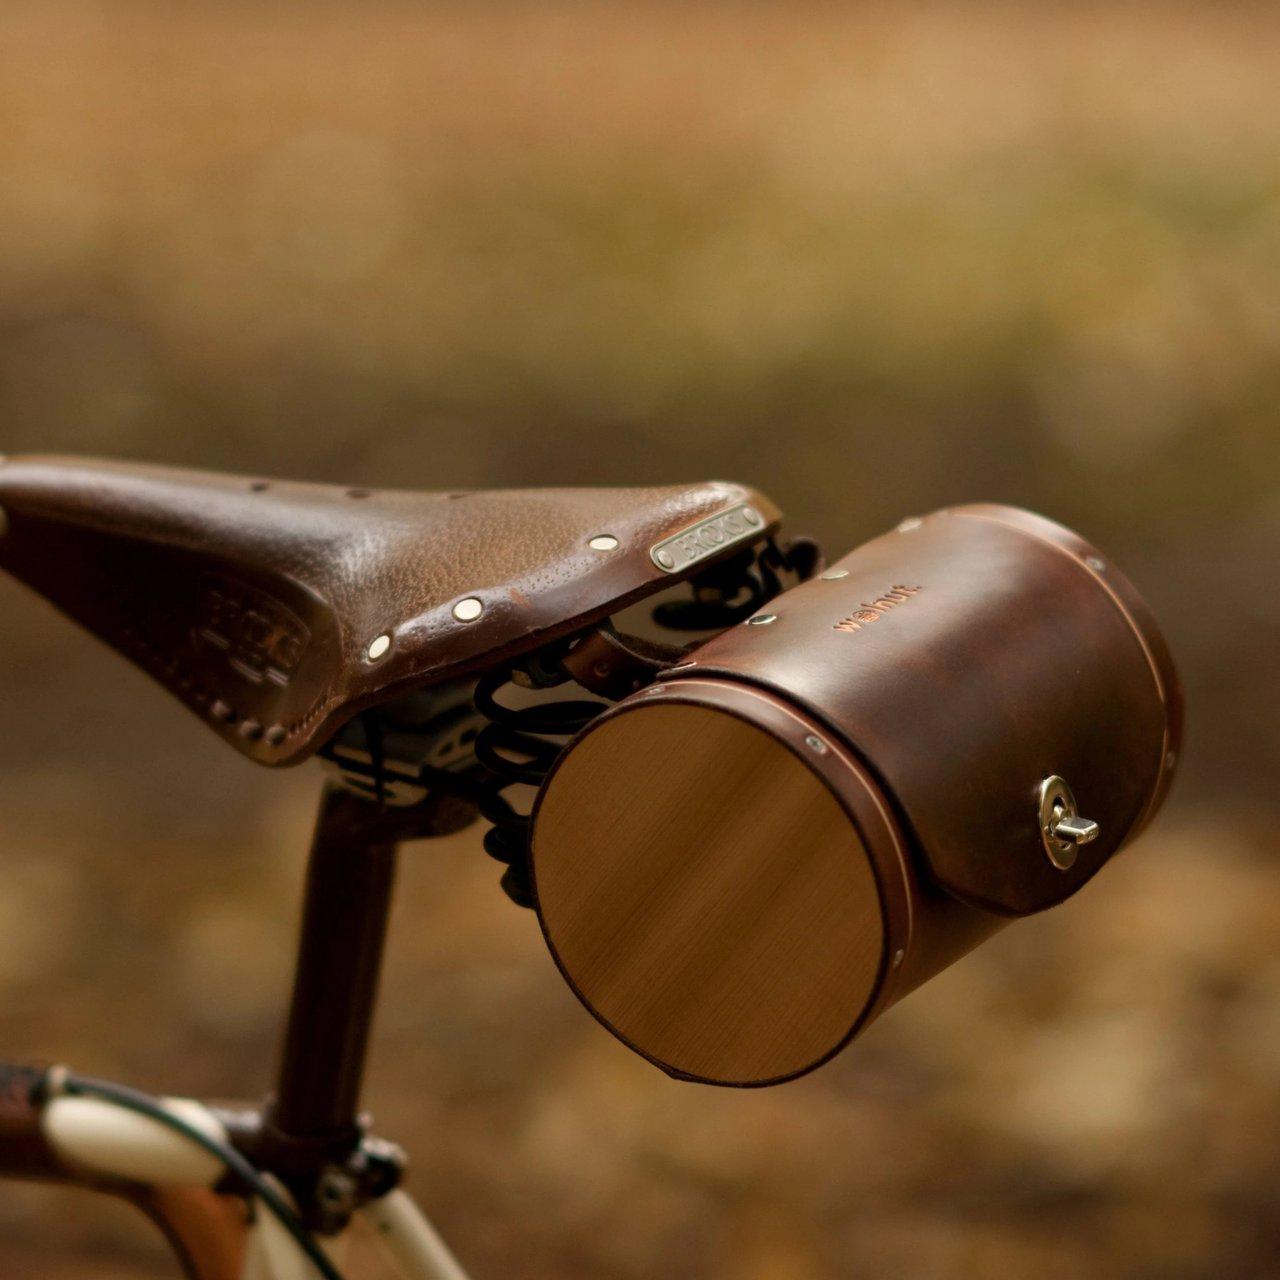 Bicycle Barrel Bag for Saddles